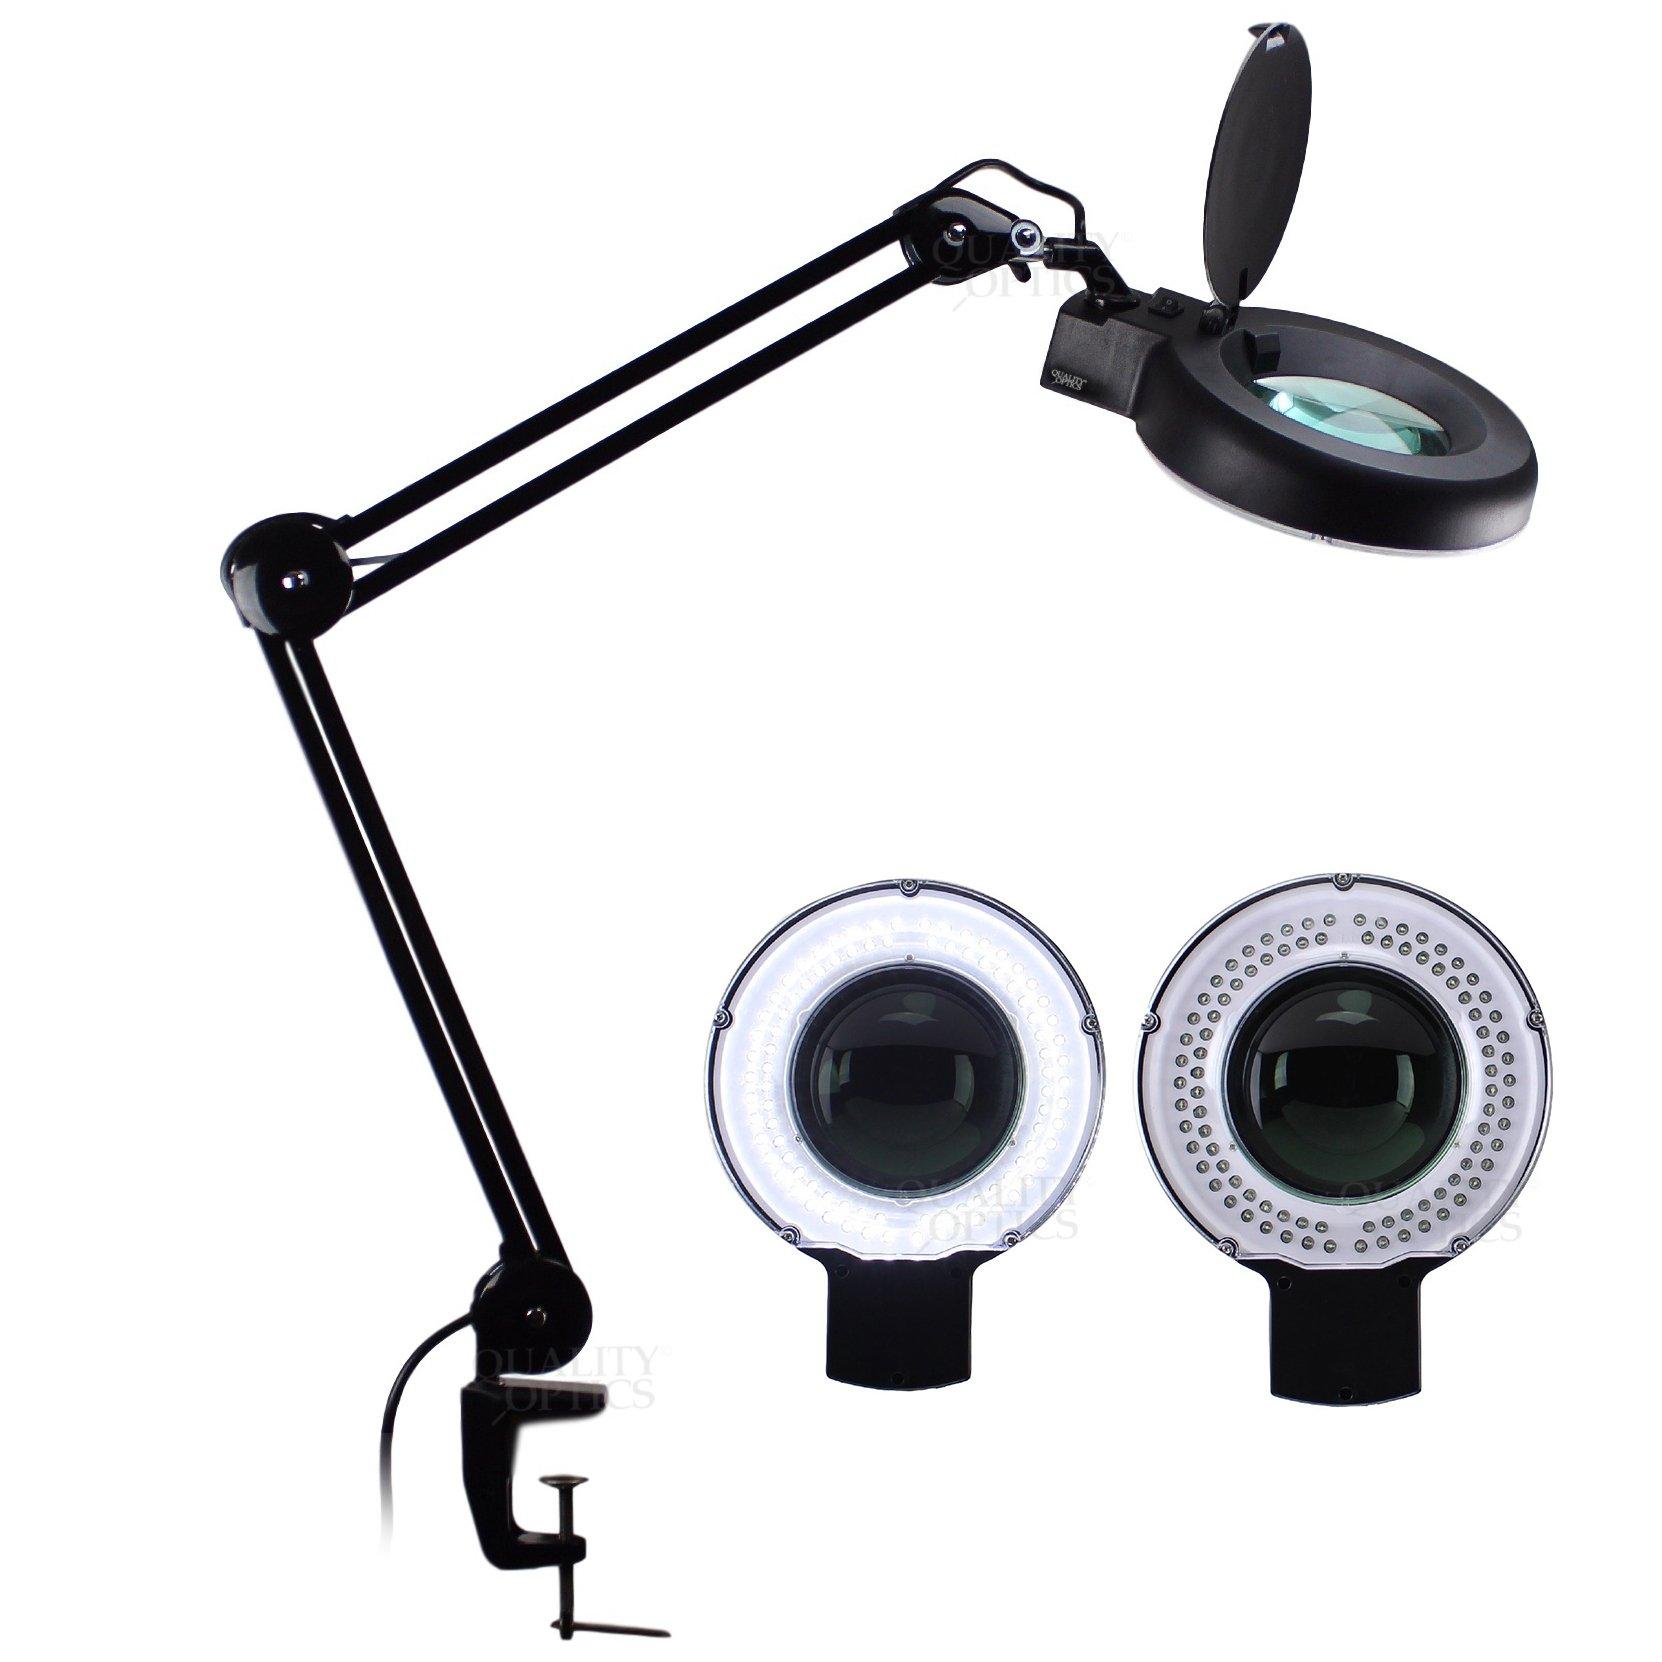 LED Desk Clamp Mount Magnifier Lamp Light Magnifying Glass Lens Diopter (8x, Black)